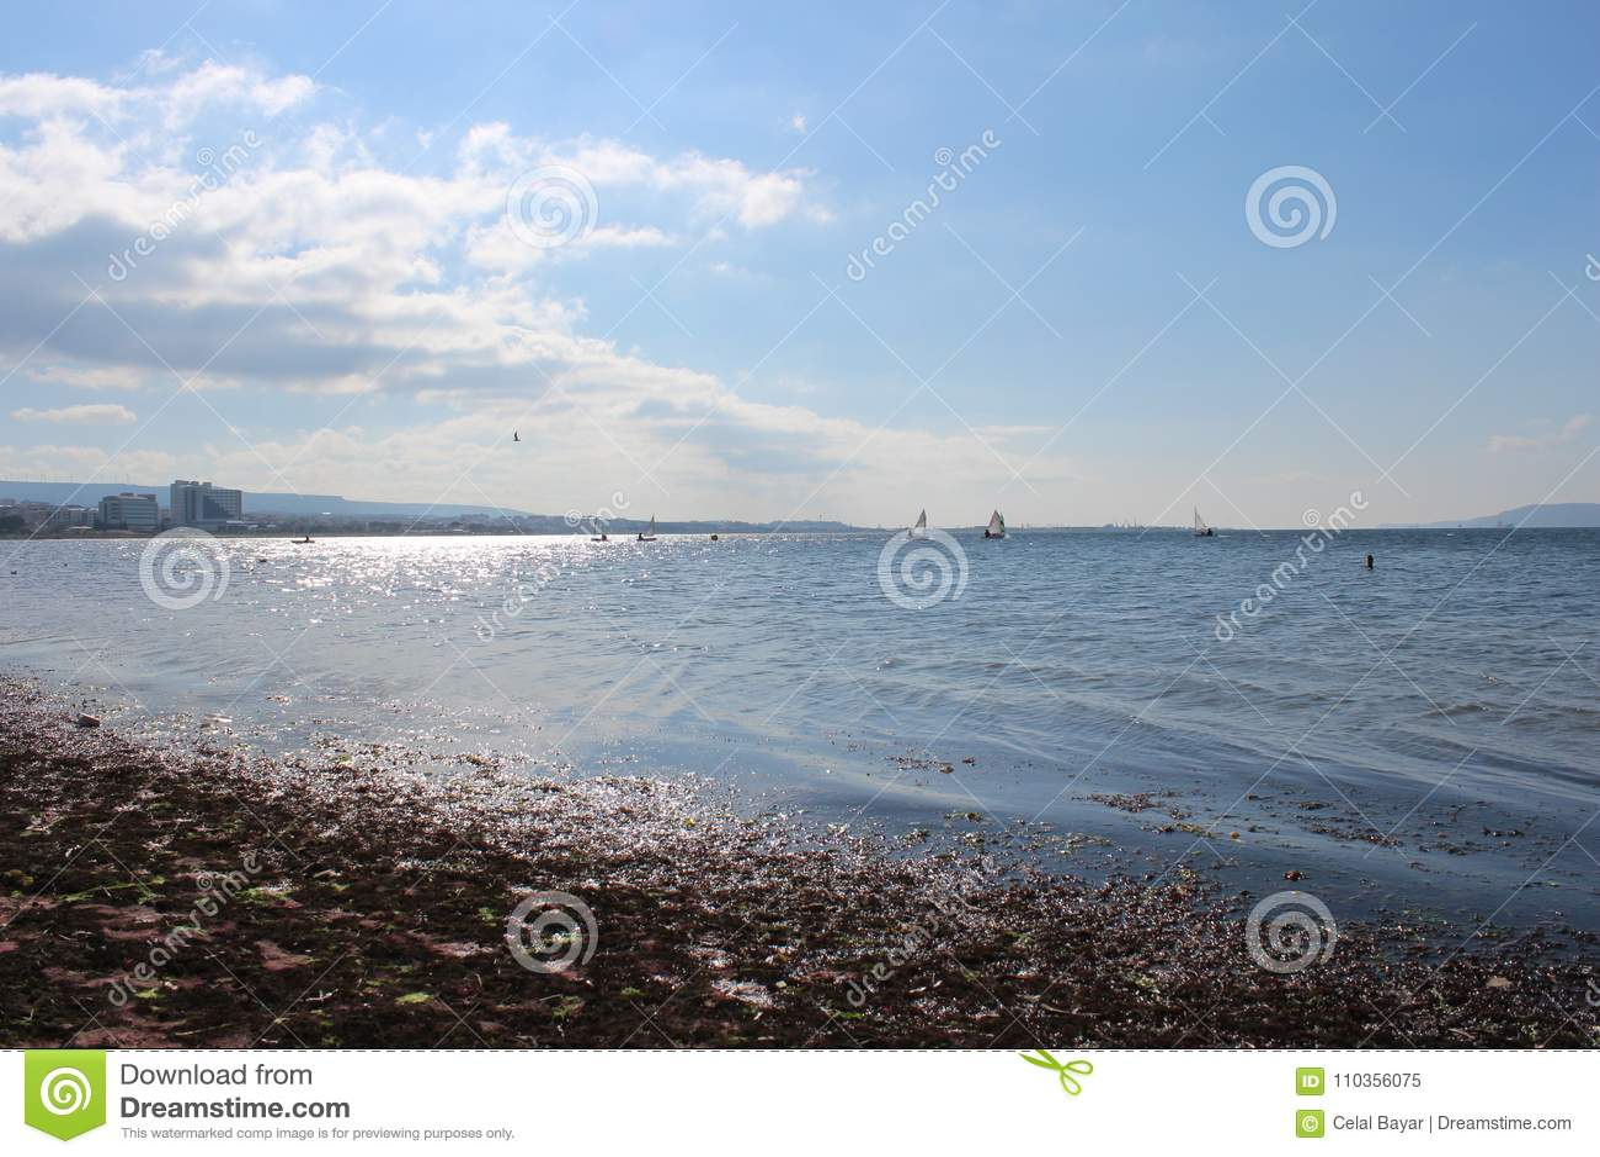 Sea and calm skies coastline